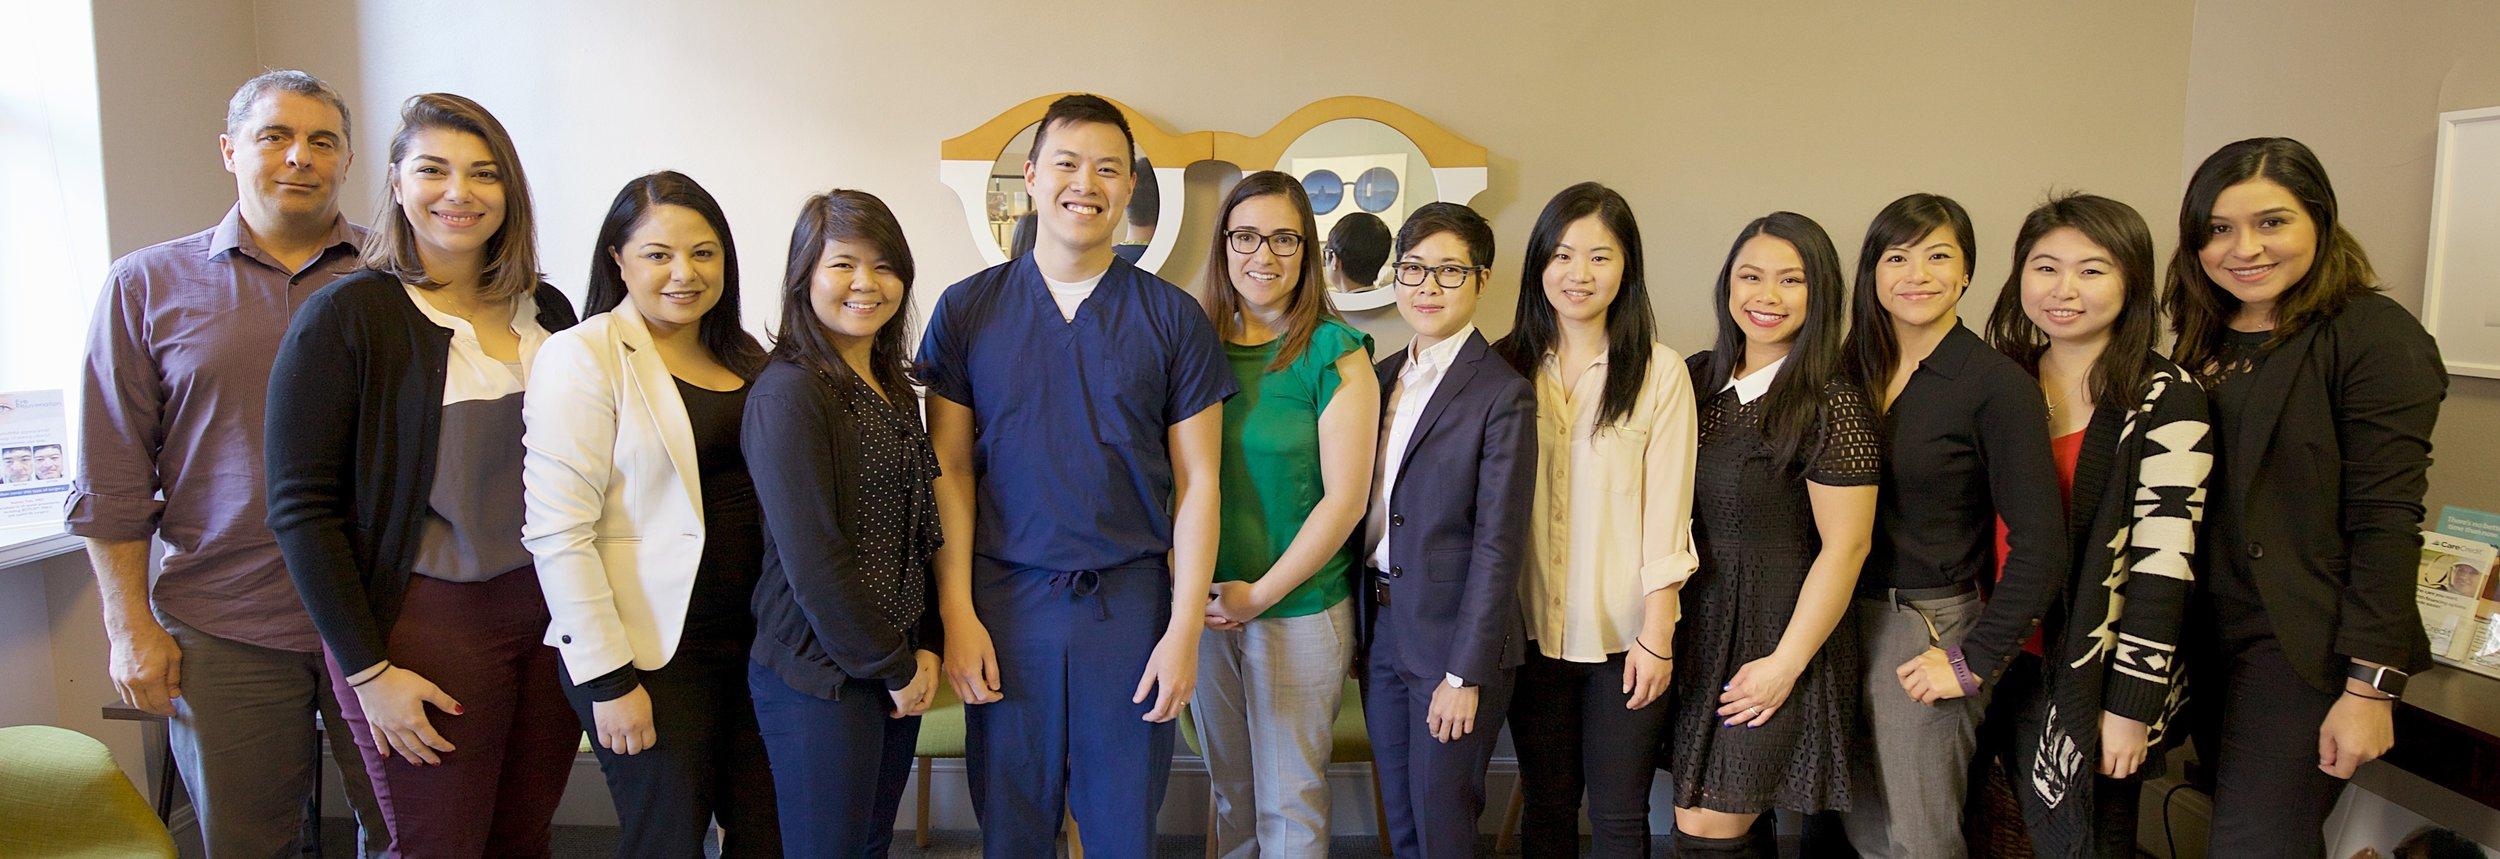 eyecare associates of san francisco team